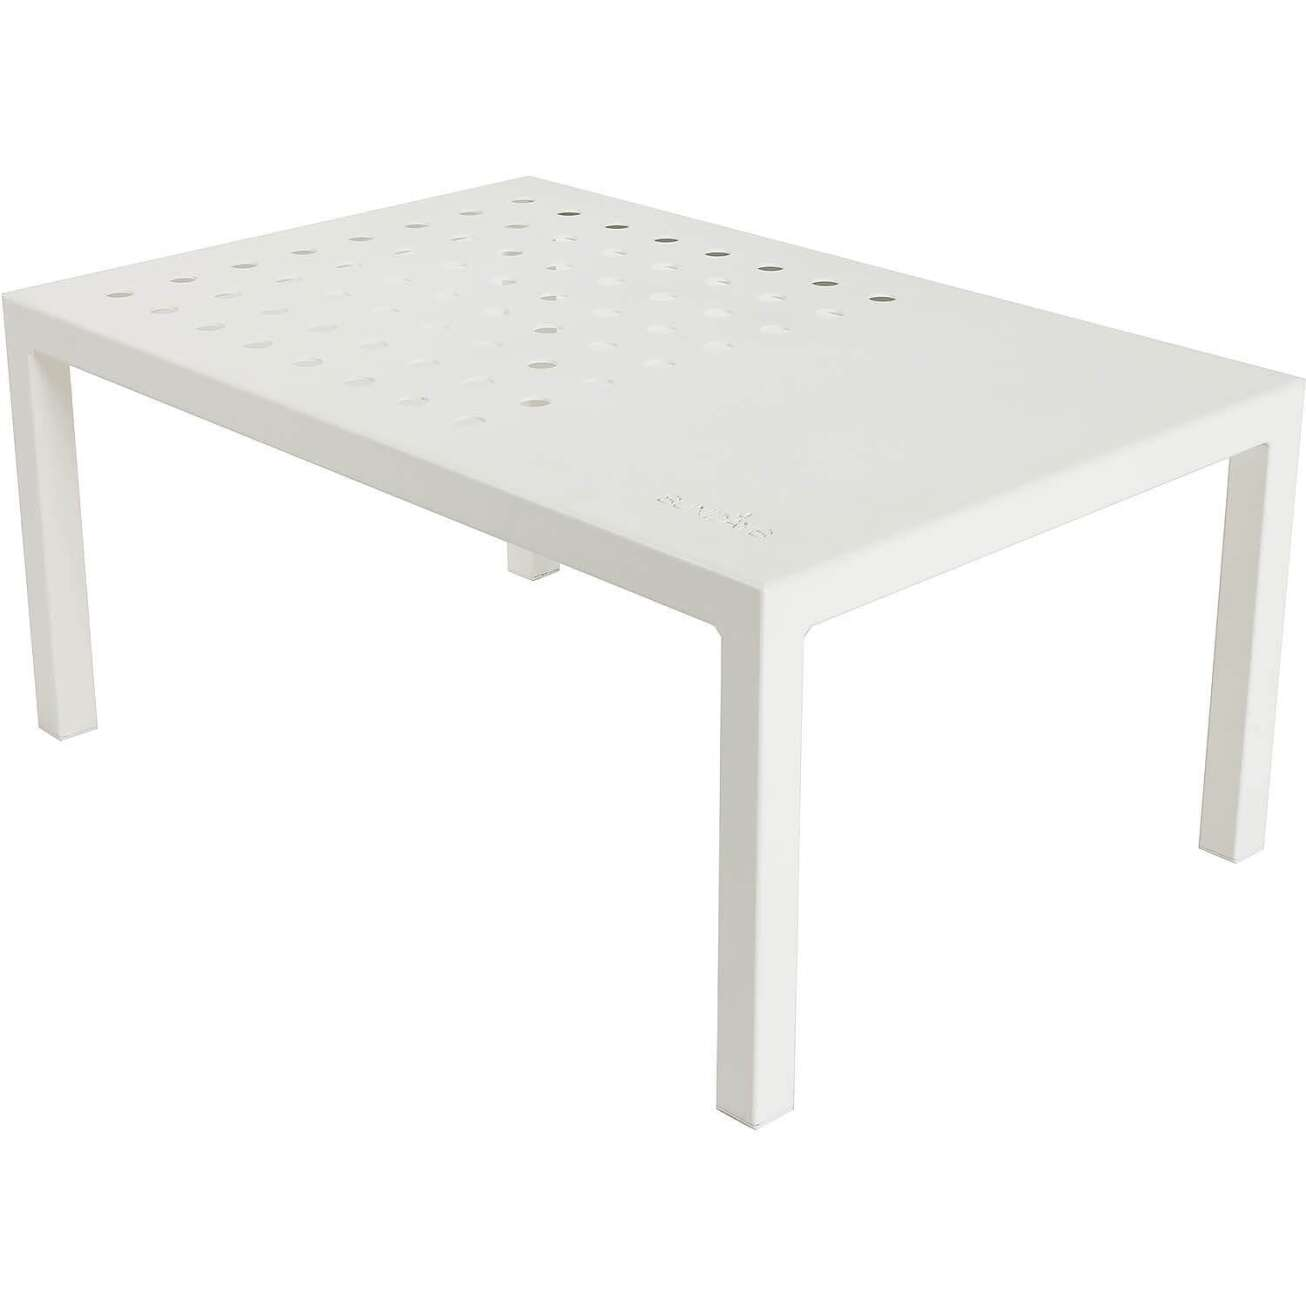 Sundays Frame sofabord i hvit aluminium